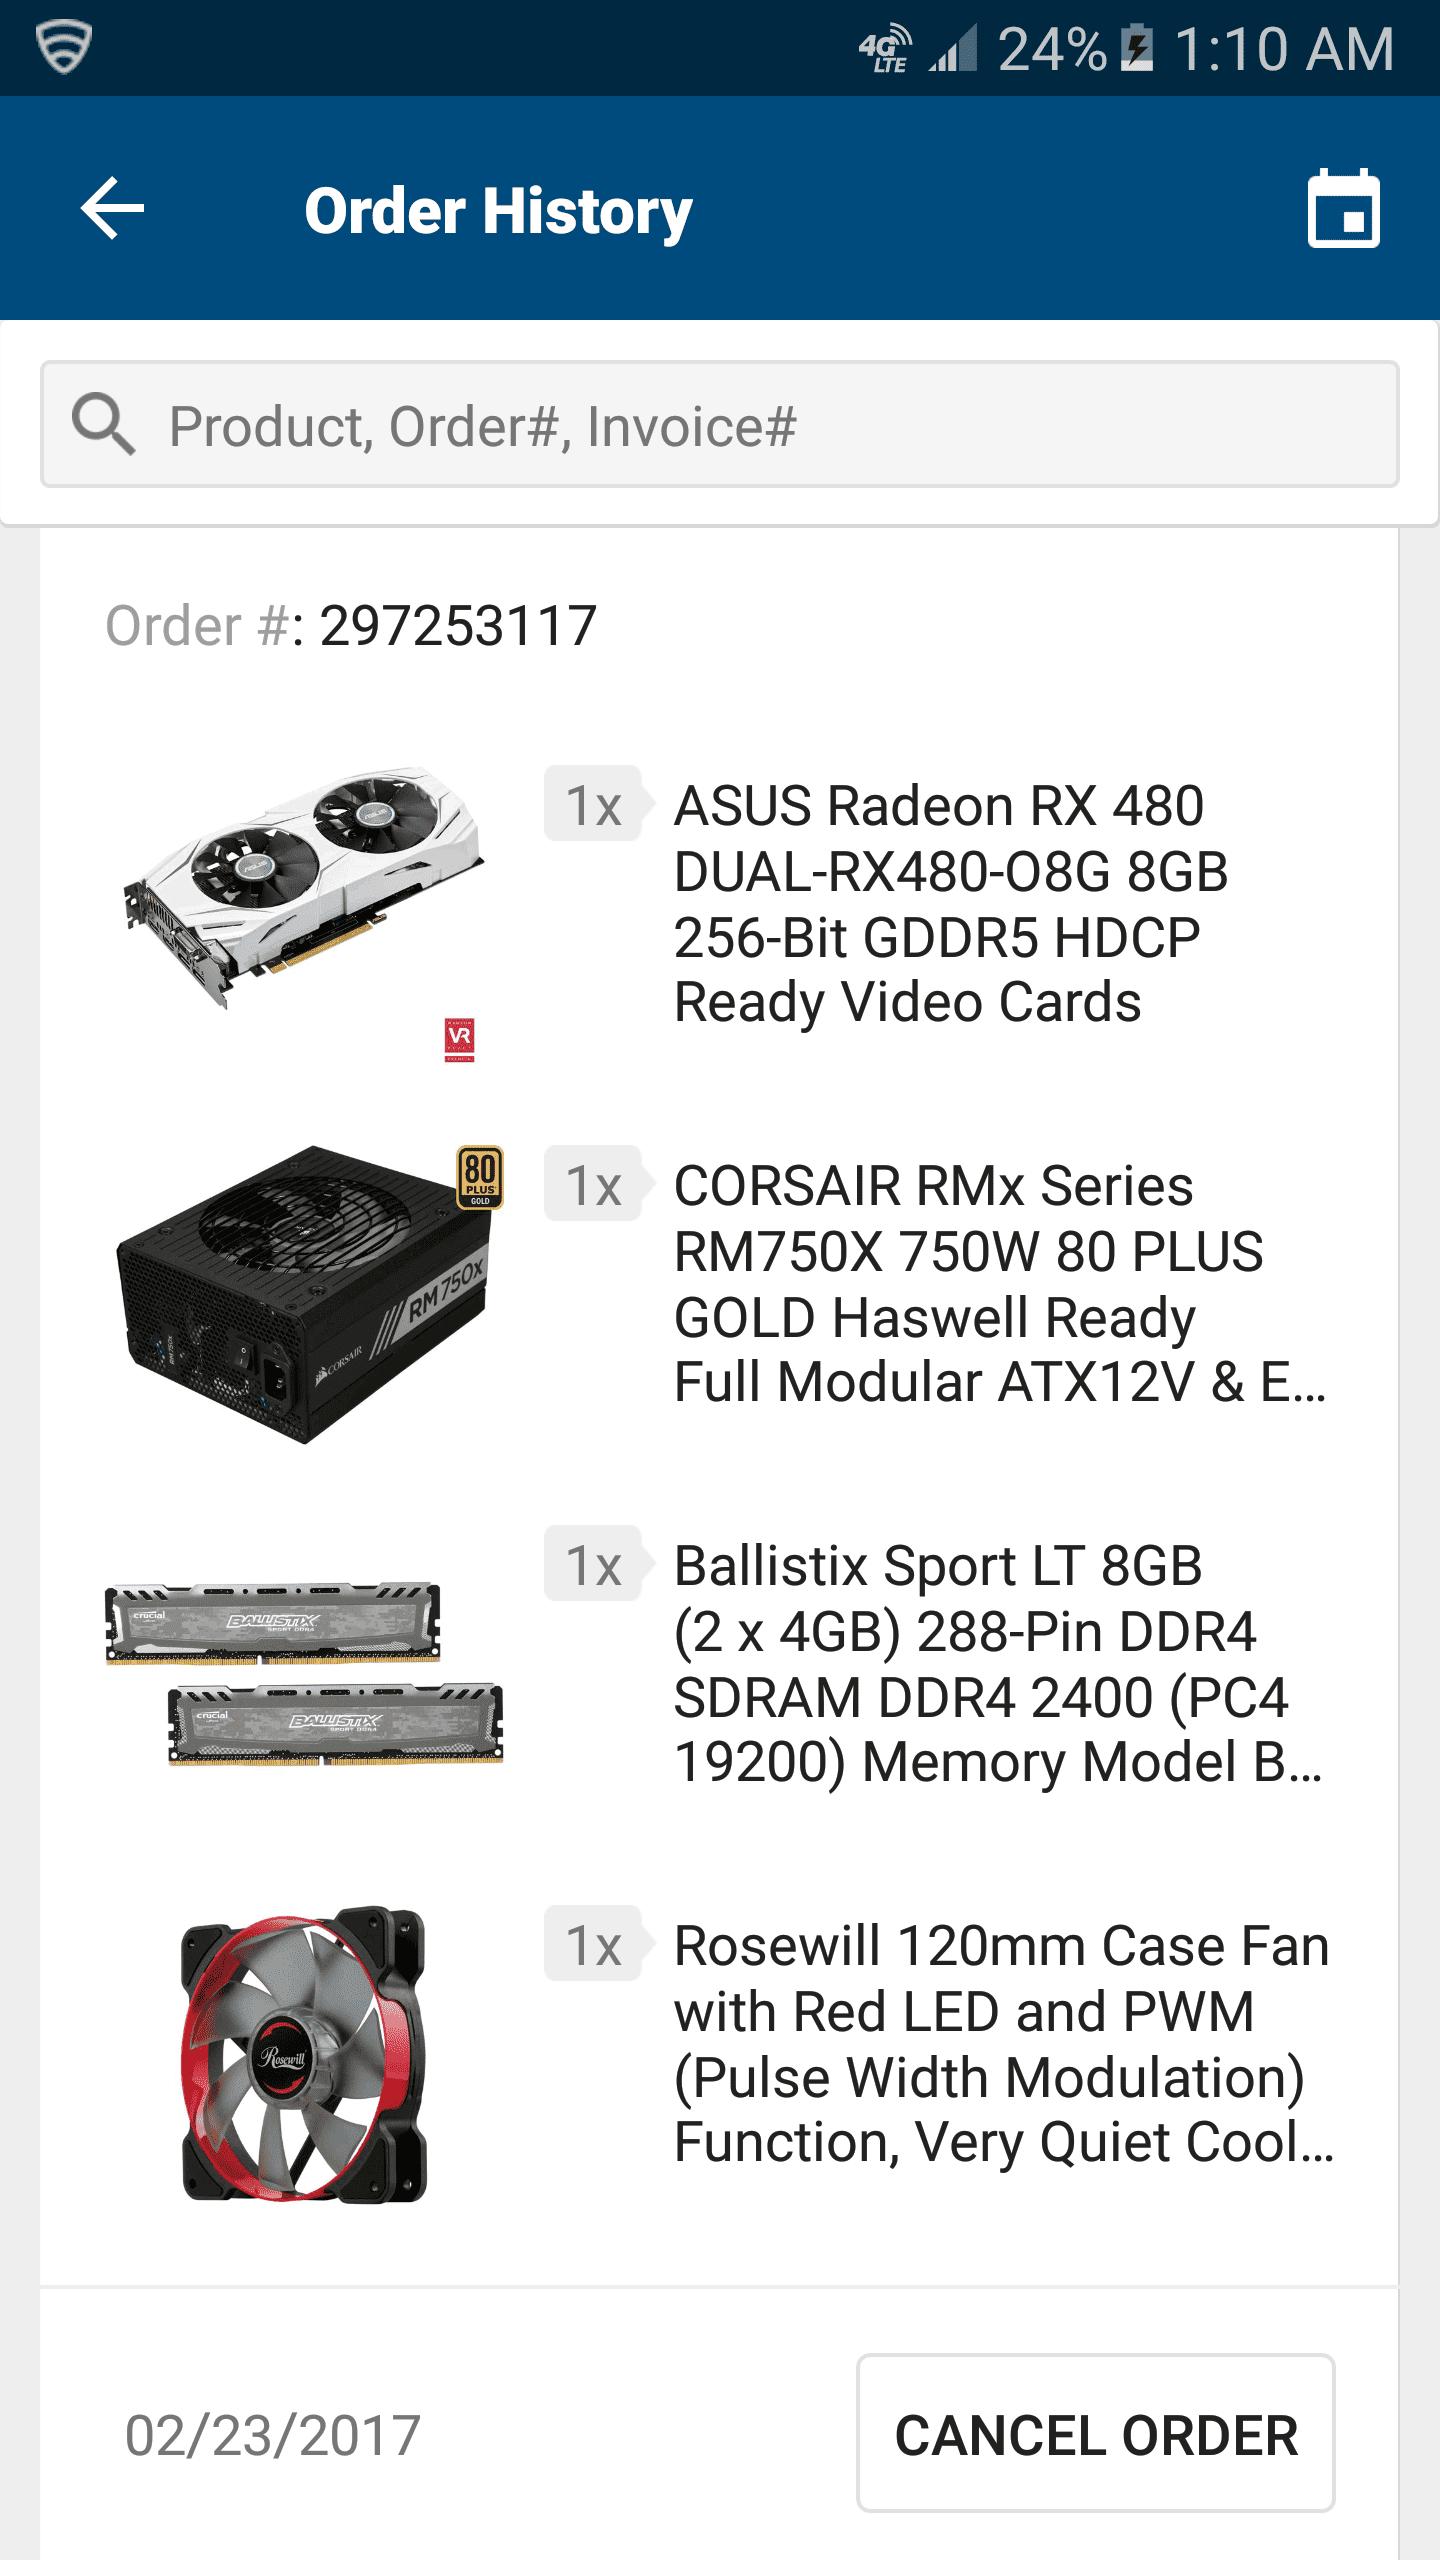 Screenshot_20170224-011019.png